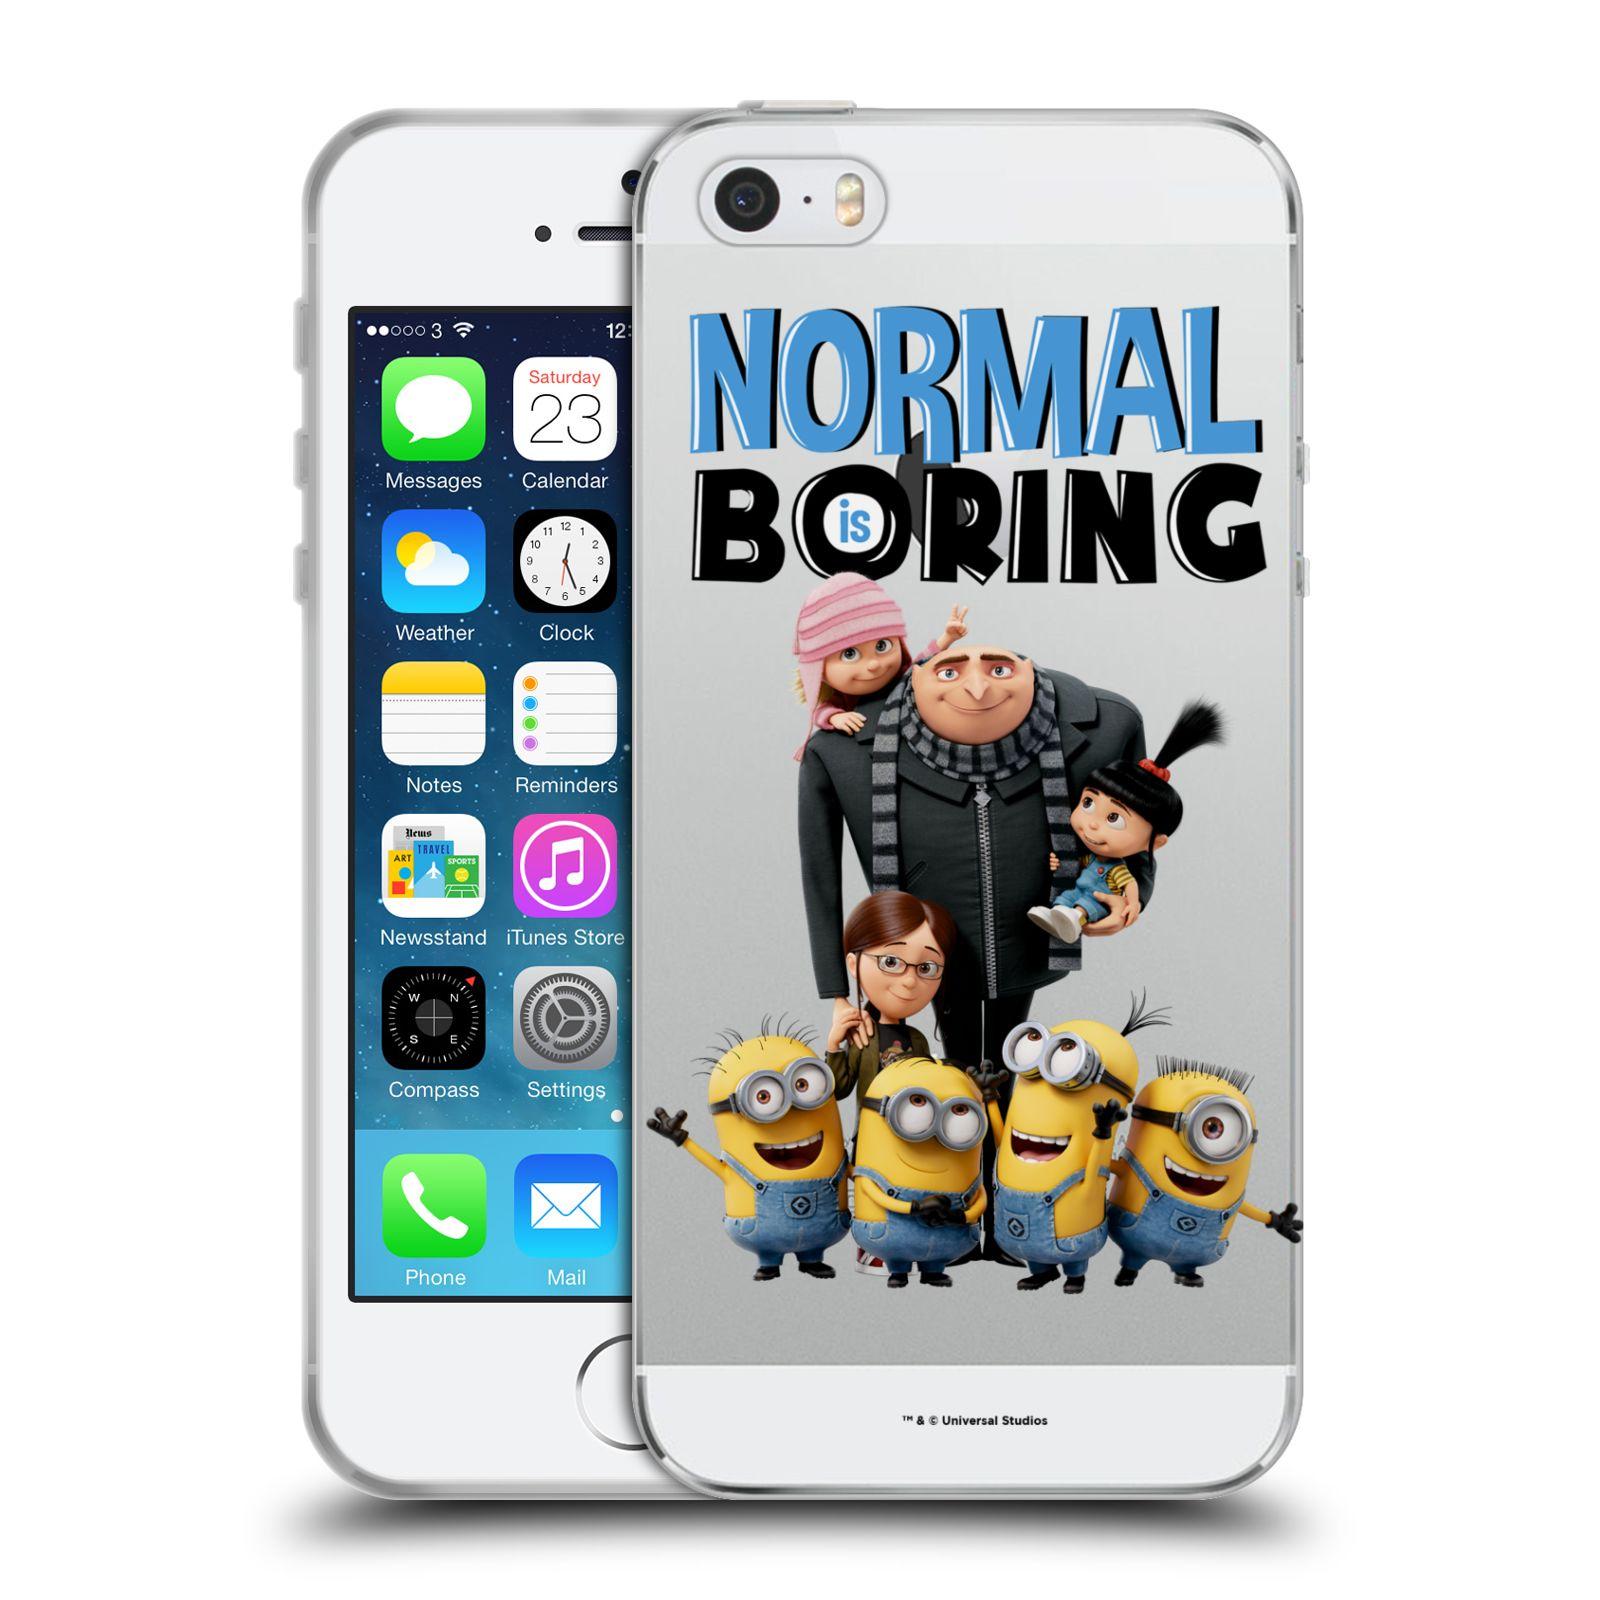 Silikonové pouzdro na mobil Apple iPhone 5, 5S, SE - Head Case - Normal is boring z filmu Já, padouch - Despicable Me